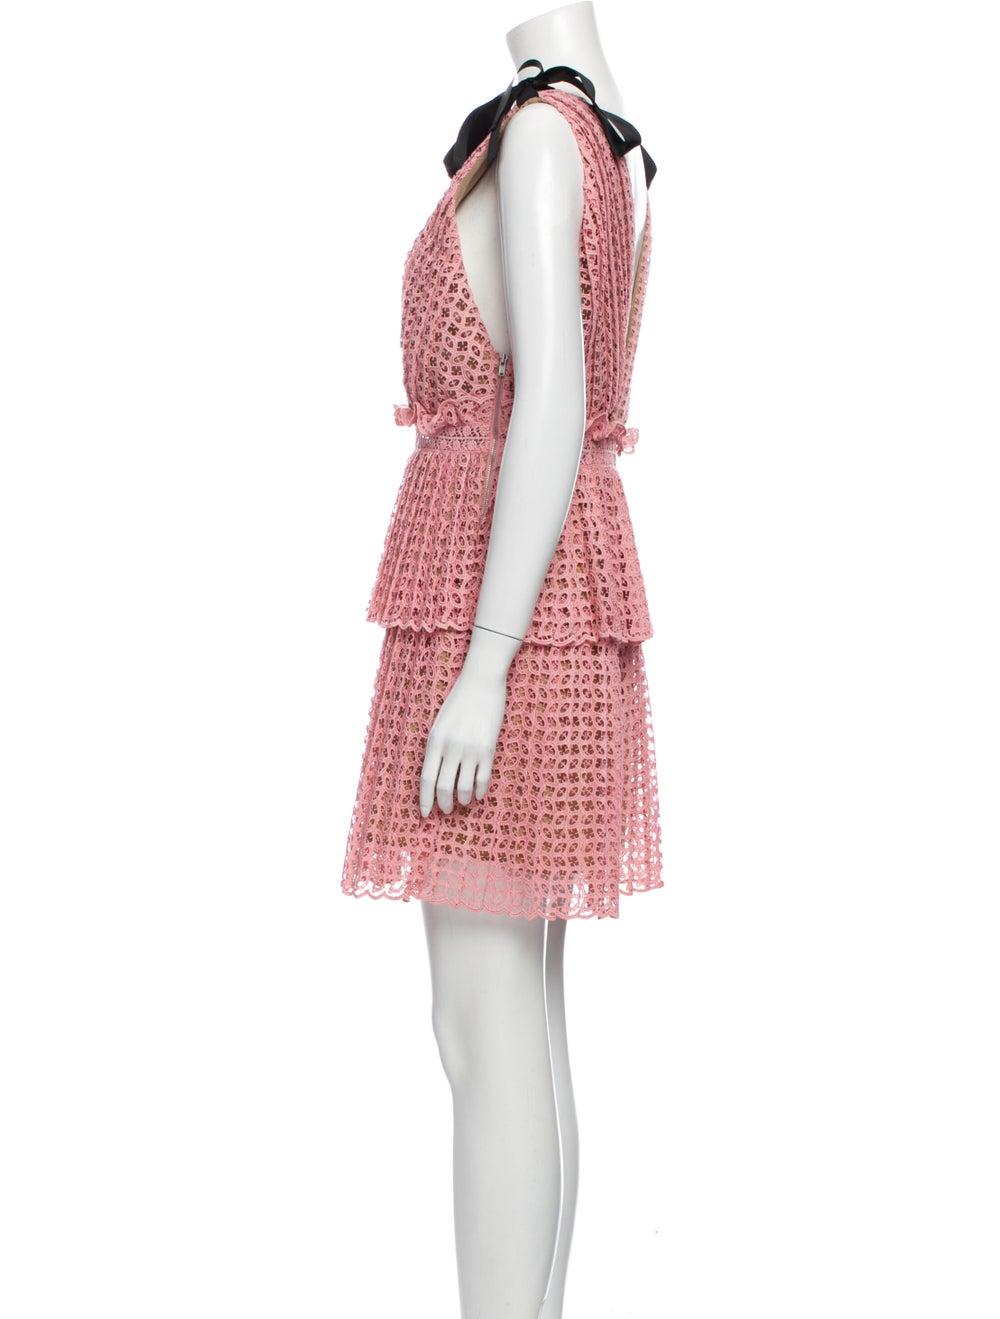 Self-Portrait Printed Mini Dress Pink - image 2